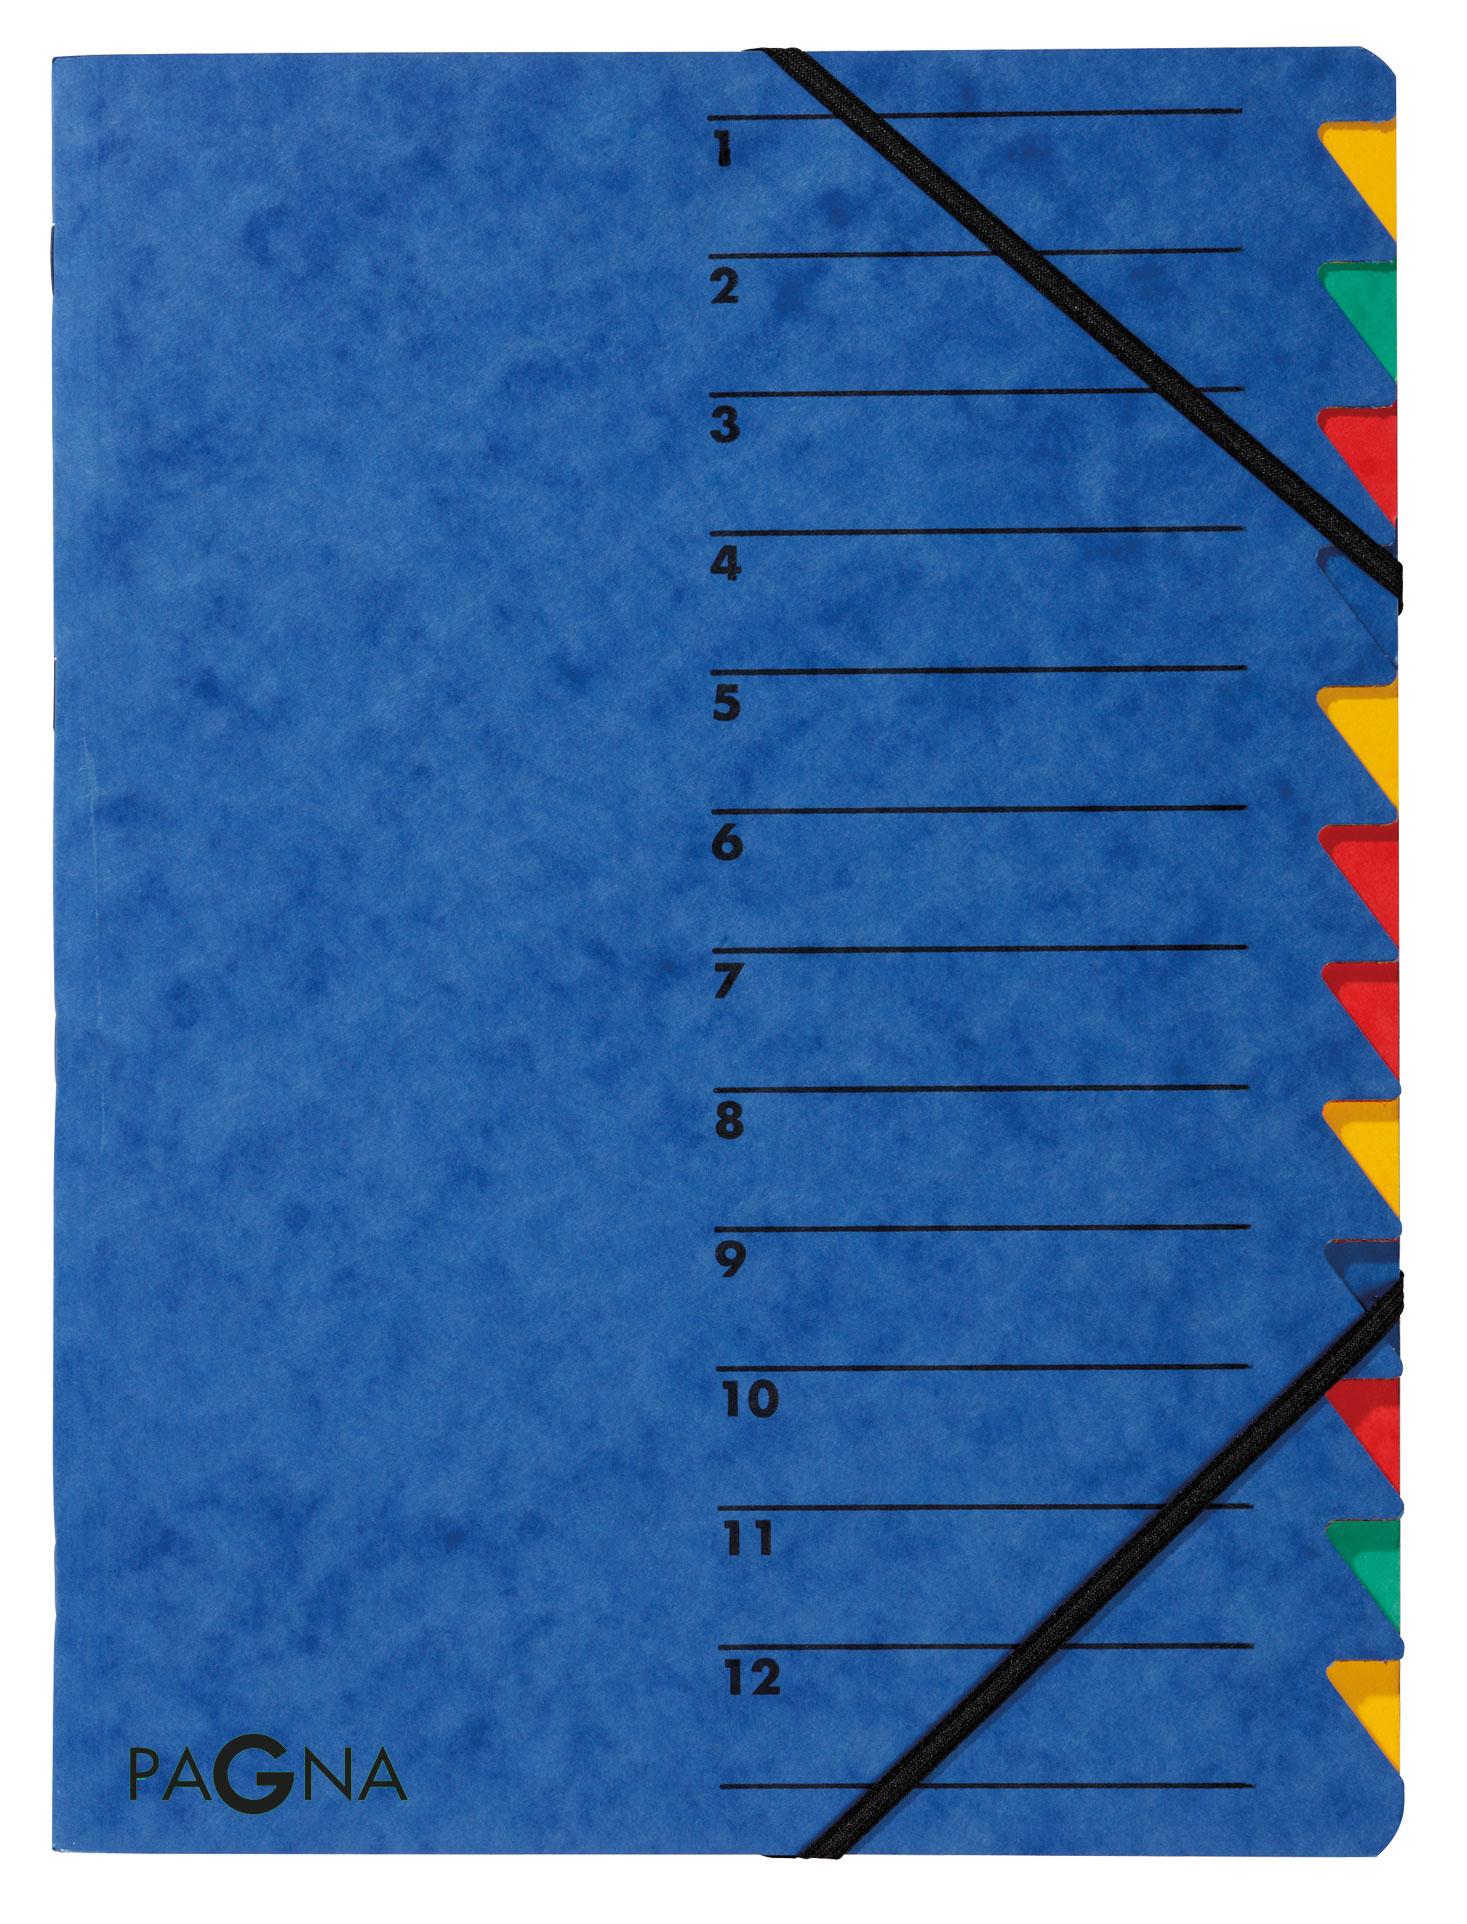 Pagna Ordnungsmappe Easy 12 Fächer - A4 - Blau - Porträt - 240 mm - 5 mm - 320 mm